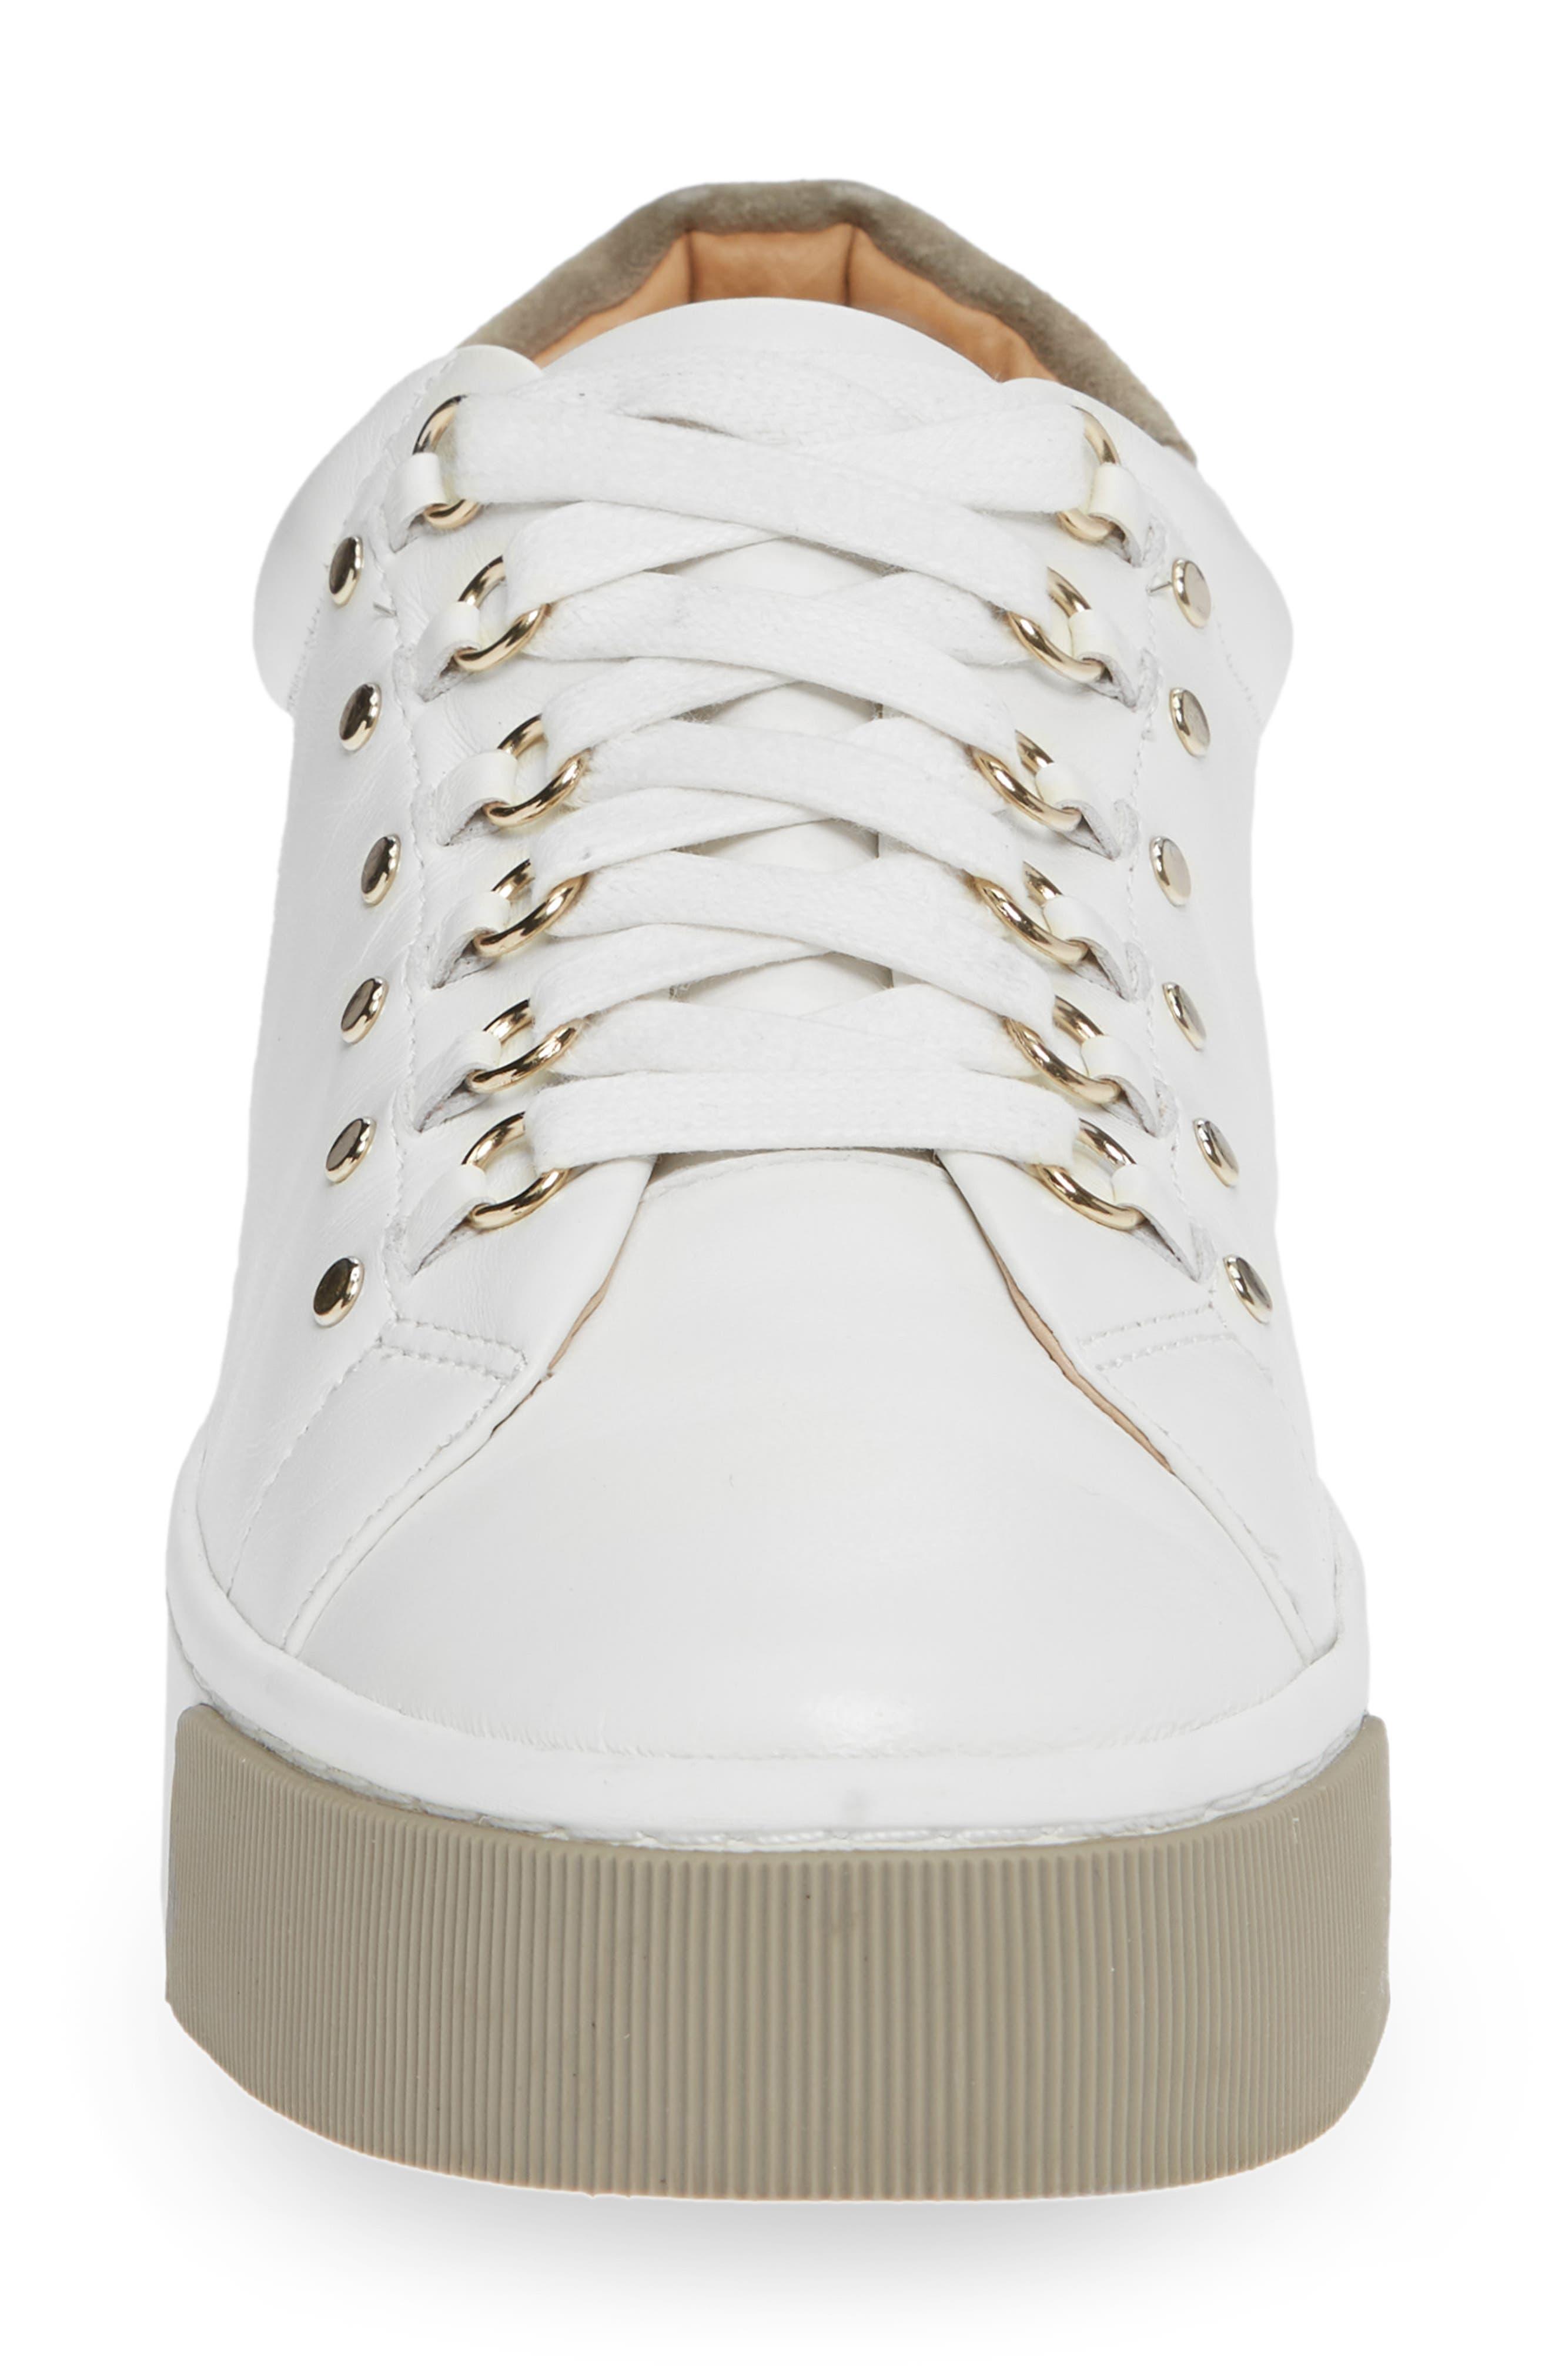 Handan Lace-Up Sneaker,                             Alternate thumbnail 4, color,                             WHITE